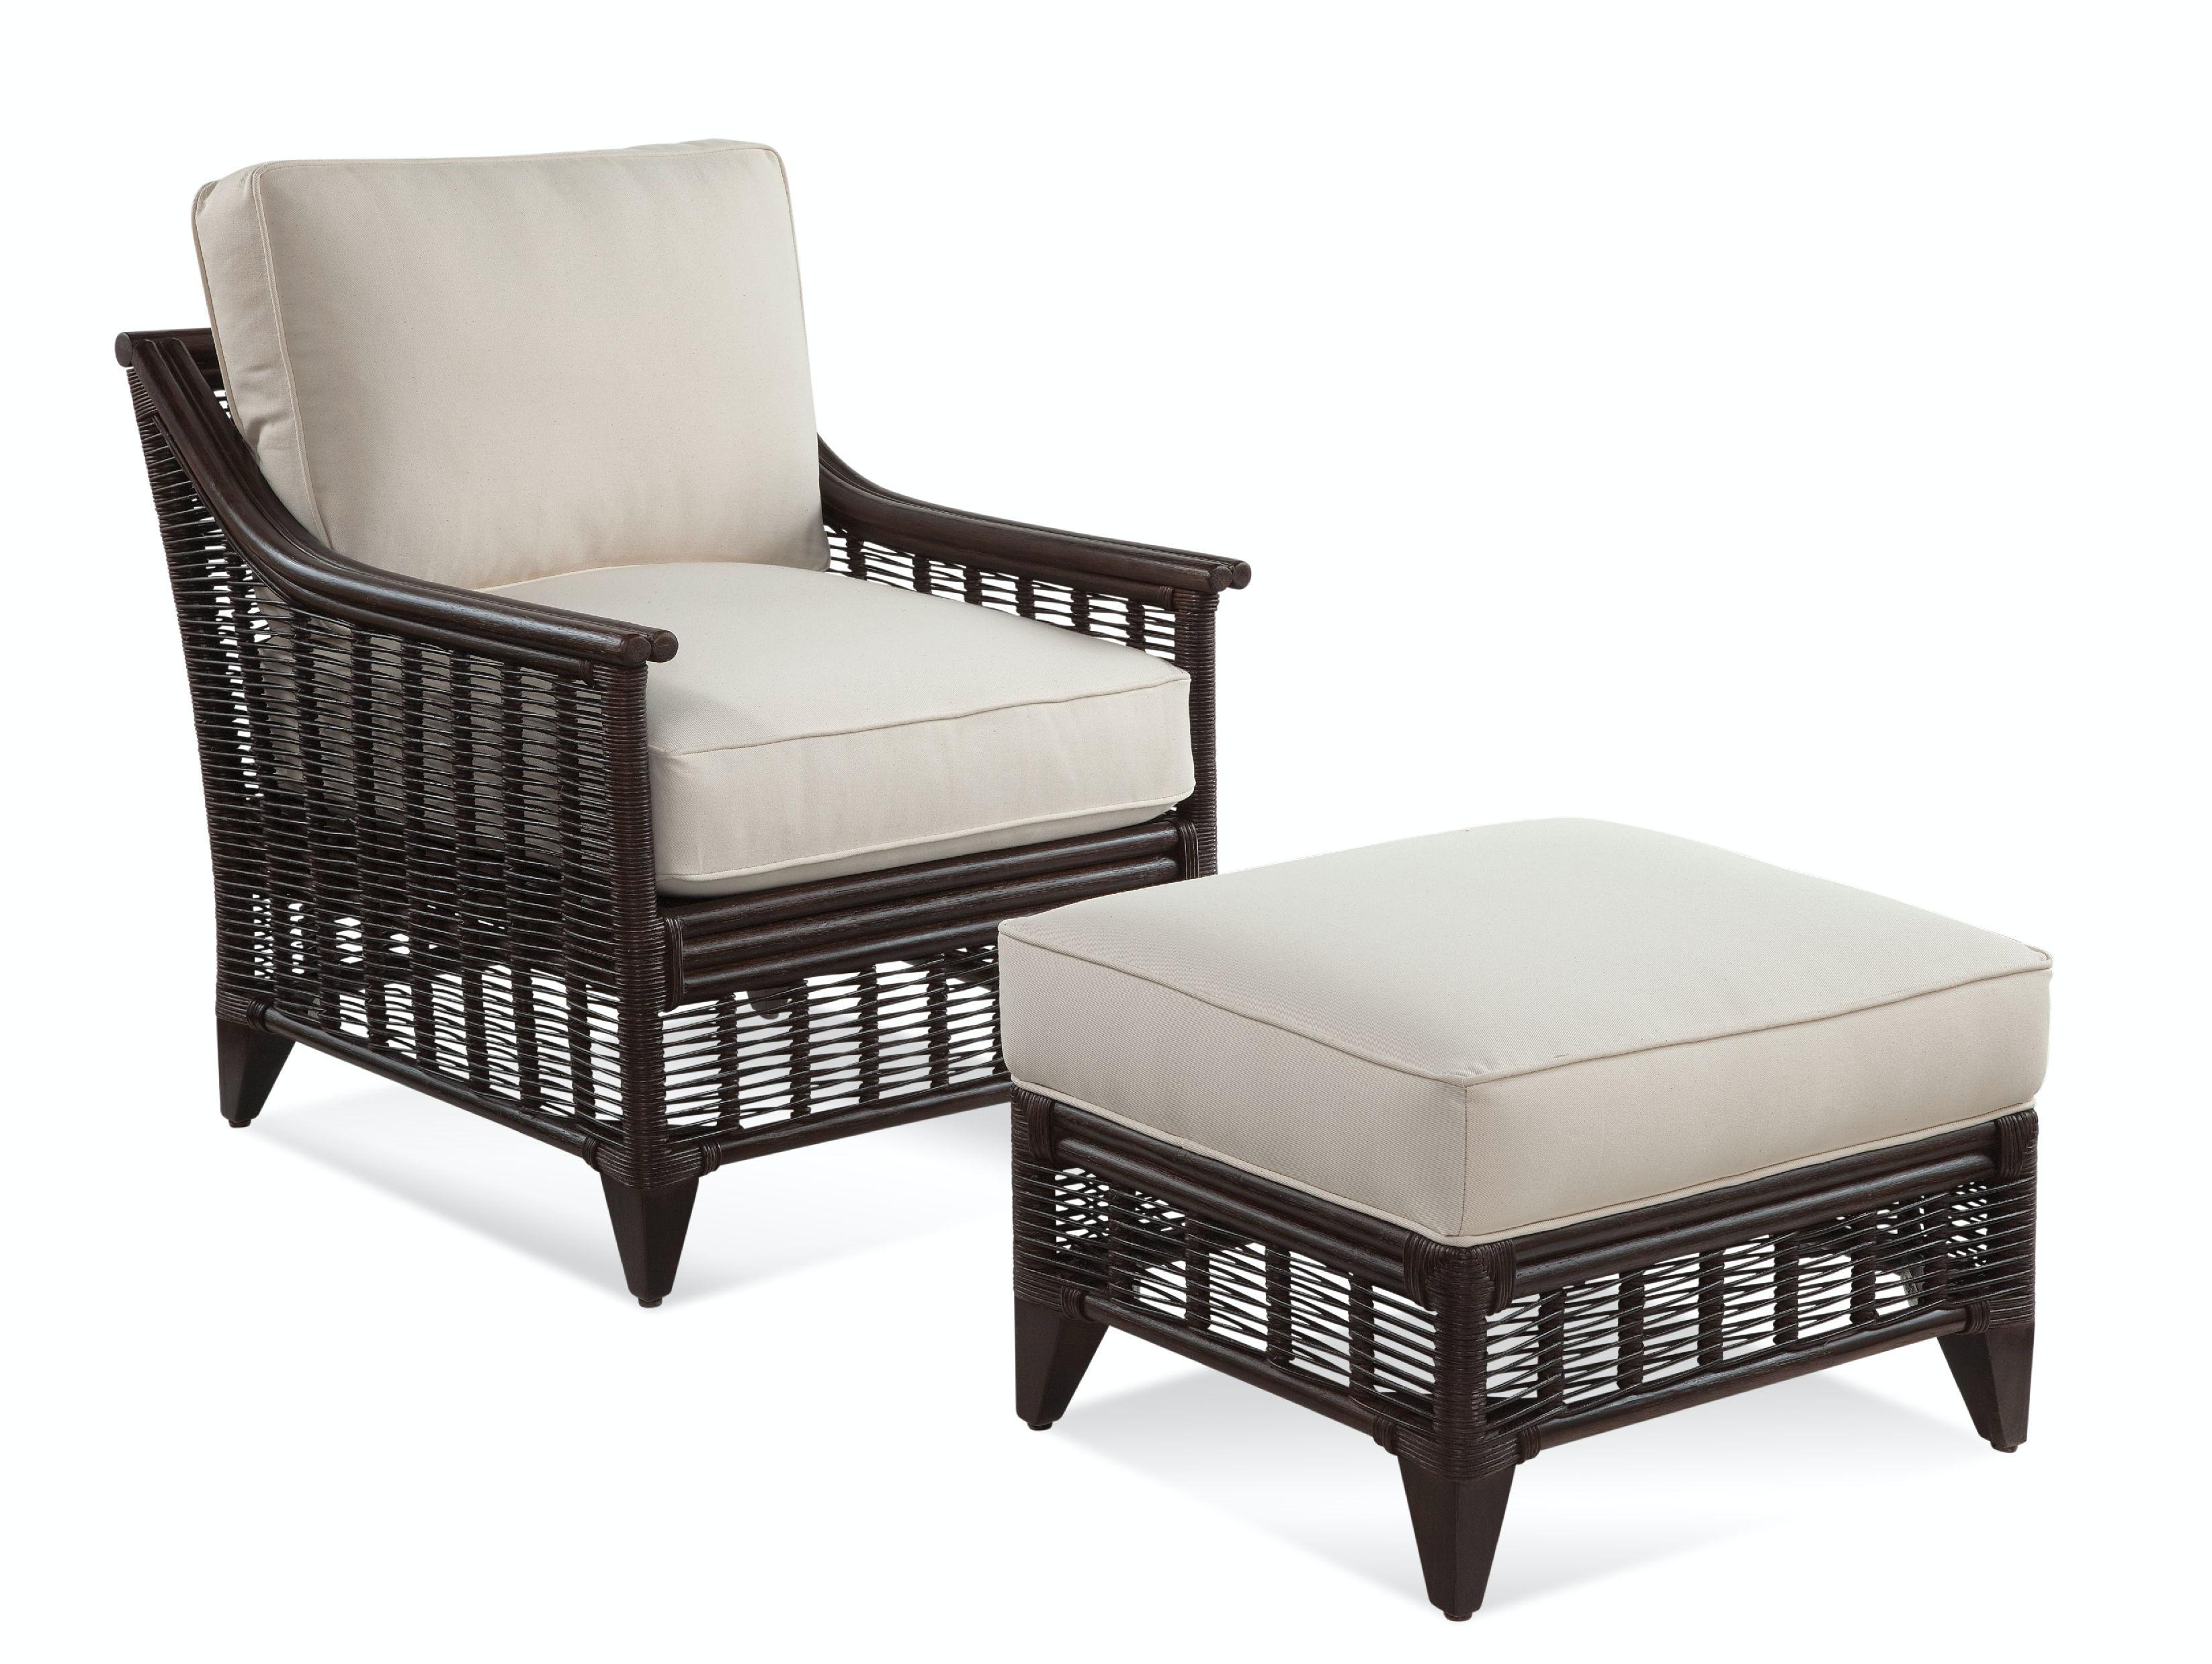 Perfect Braxton Culler Living Room Chair 1917 001   Quality Furniture   Murfreesboro,  TN